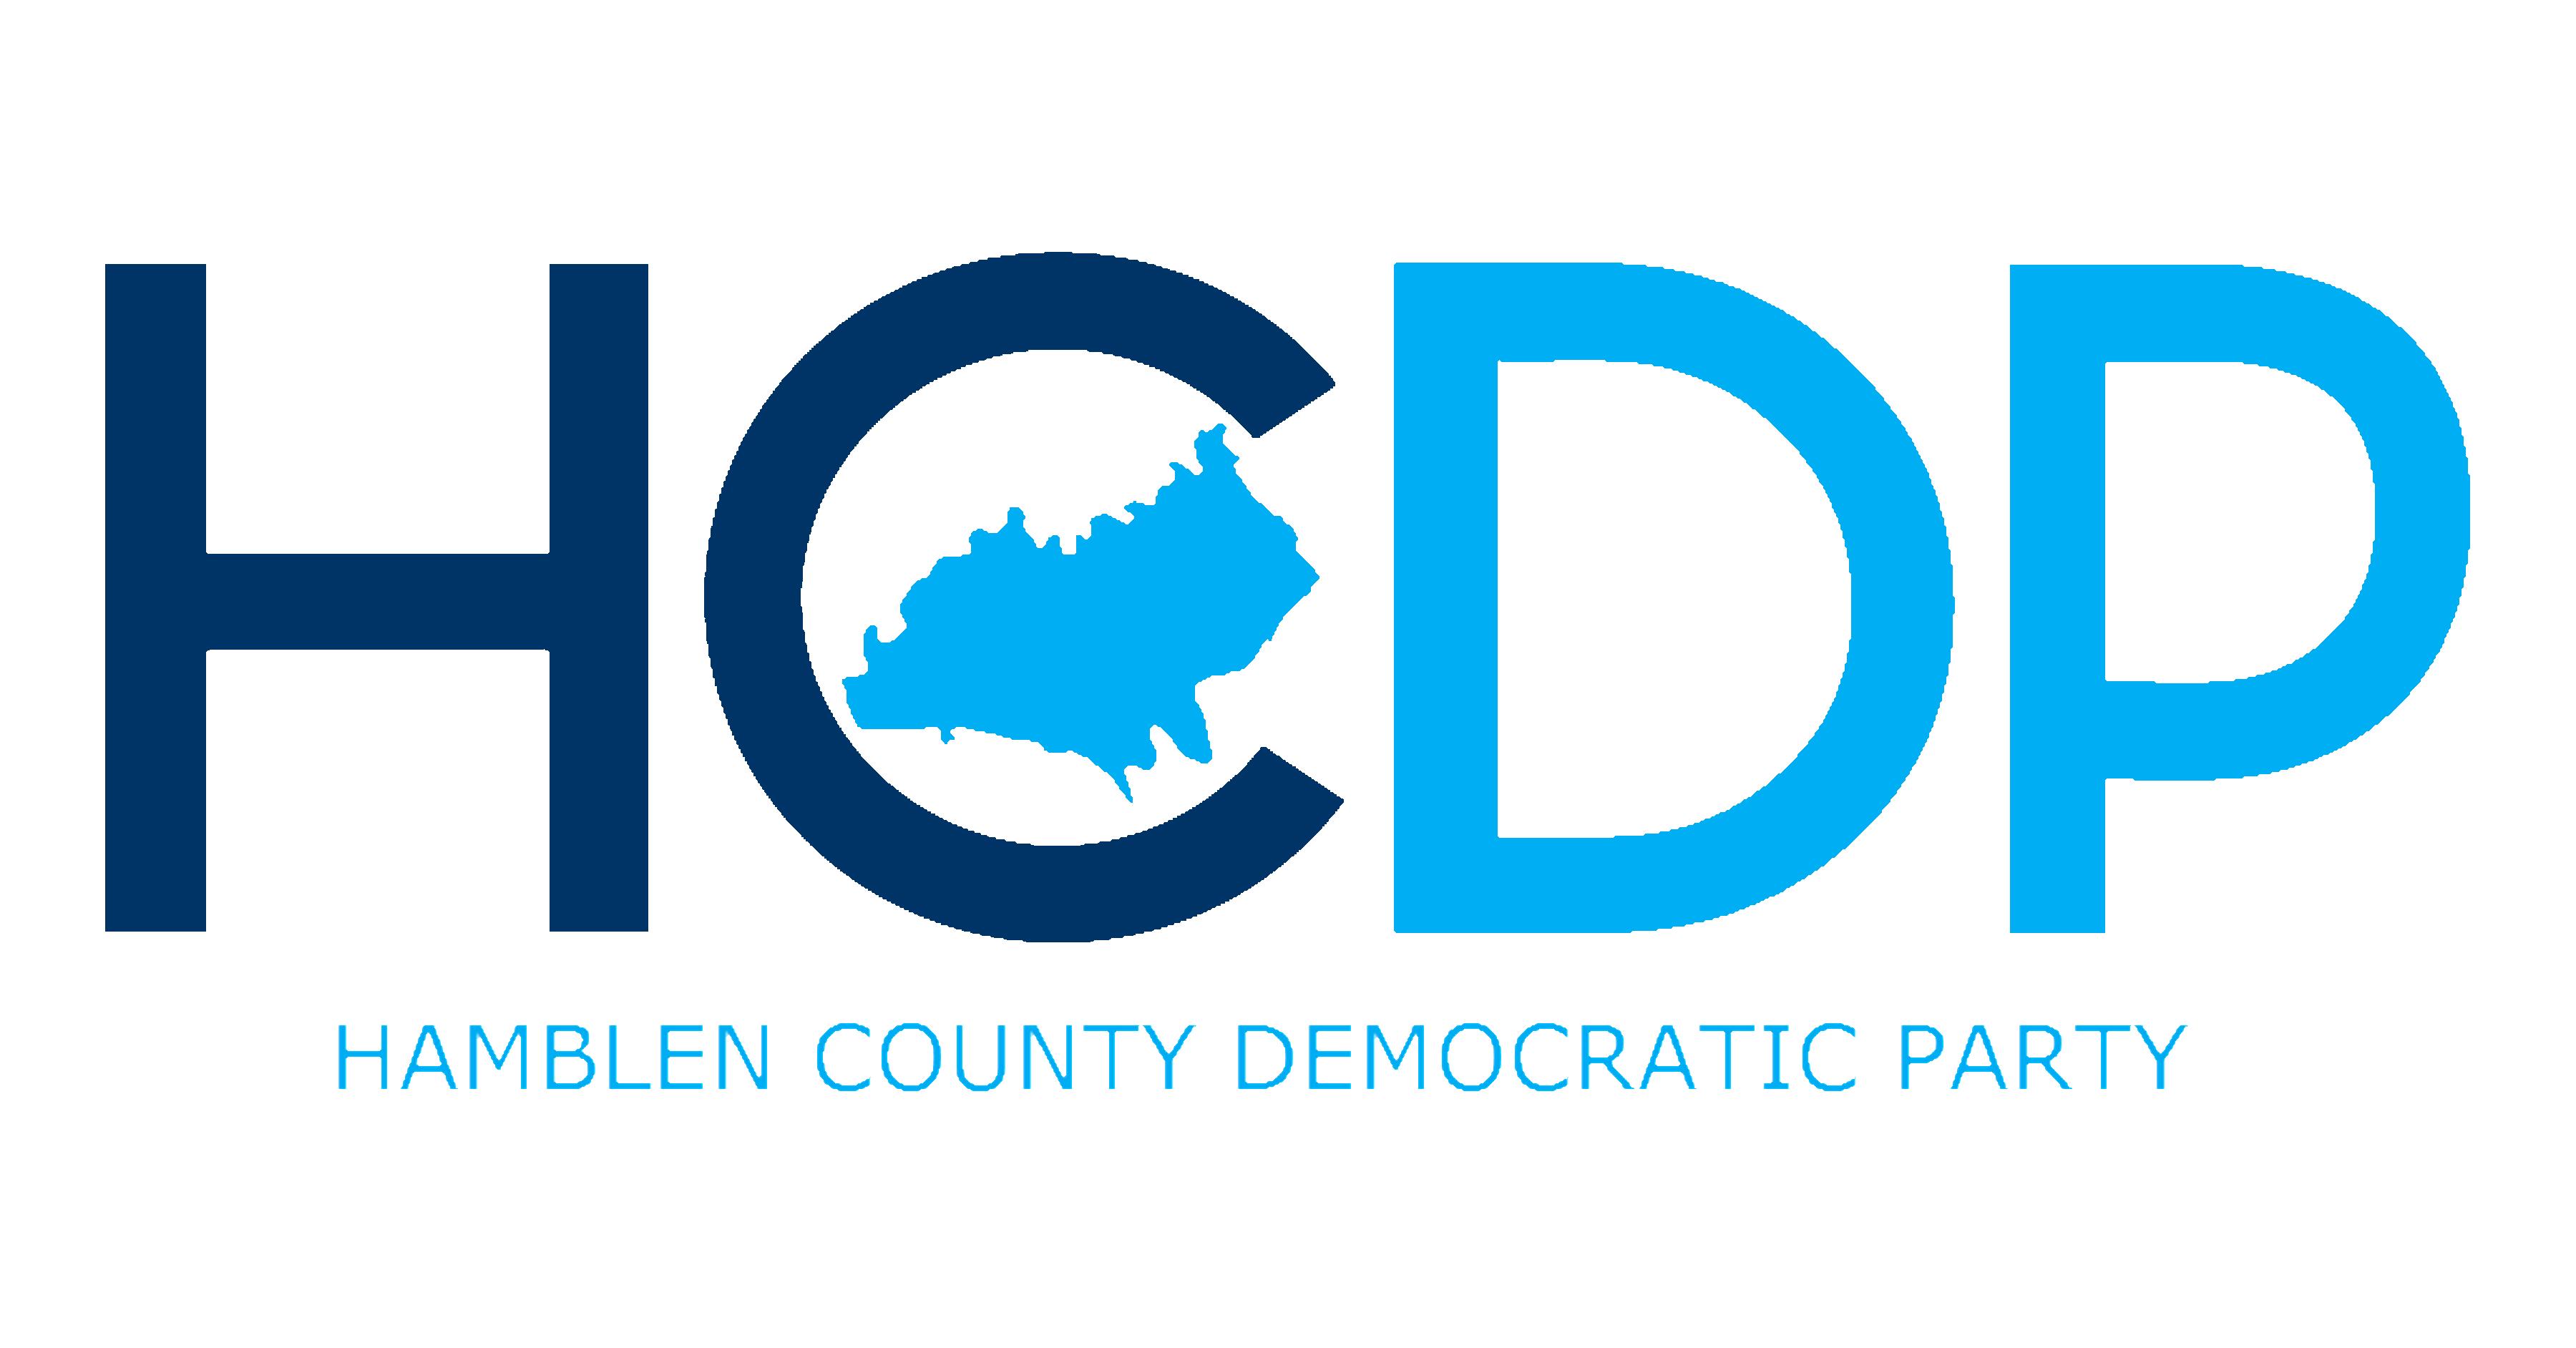 Hamblen County Democratic Party (TN)